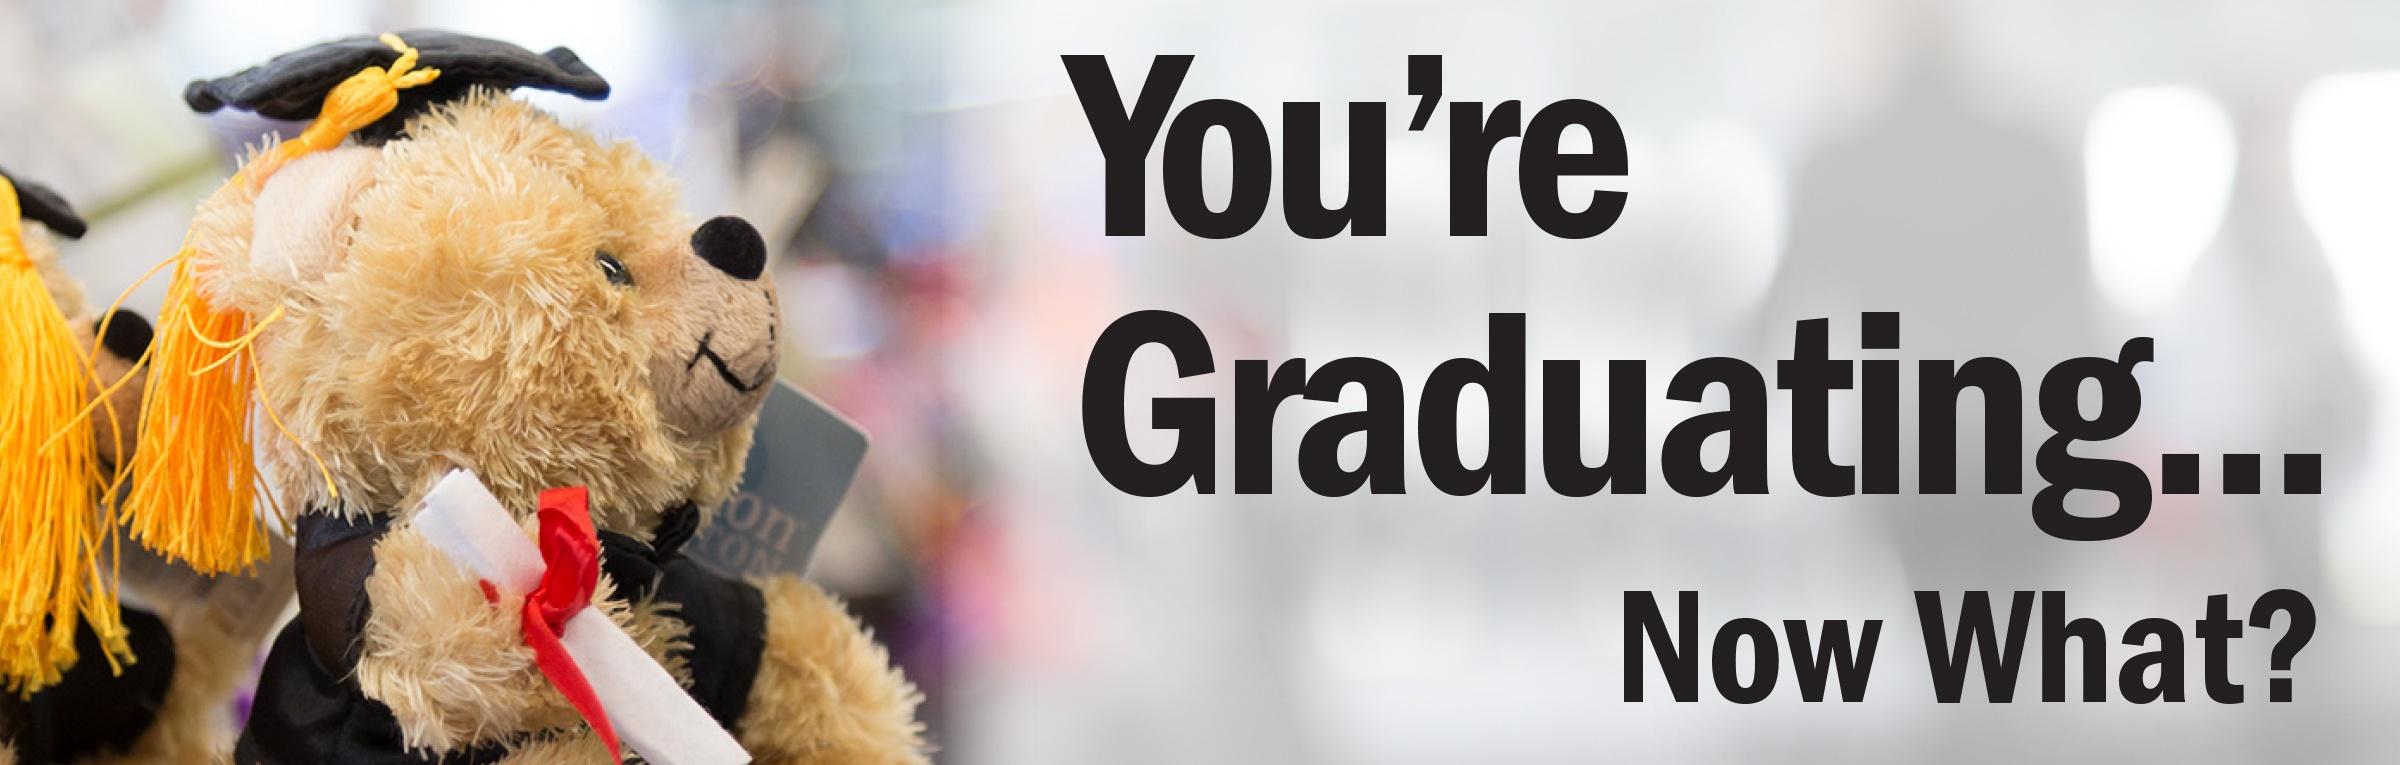 youre graduating ban